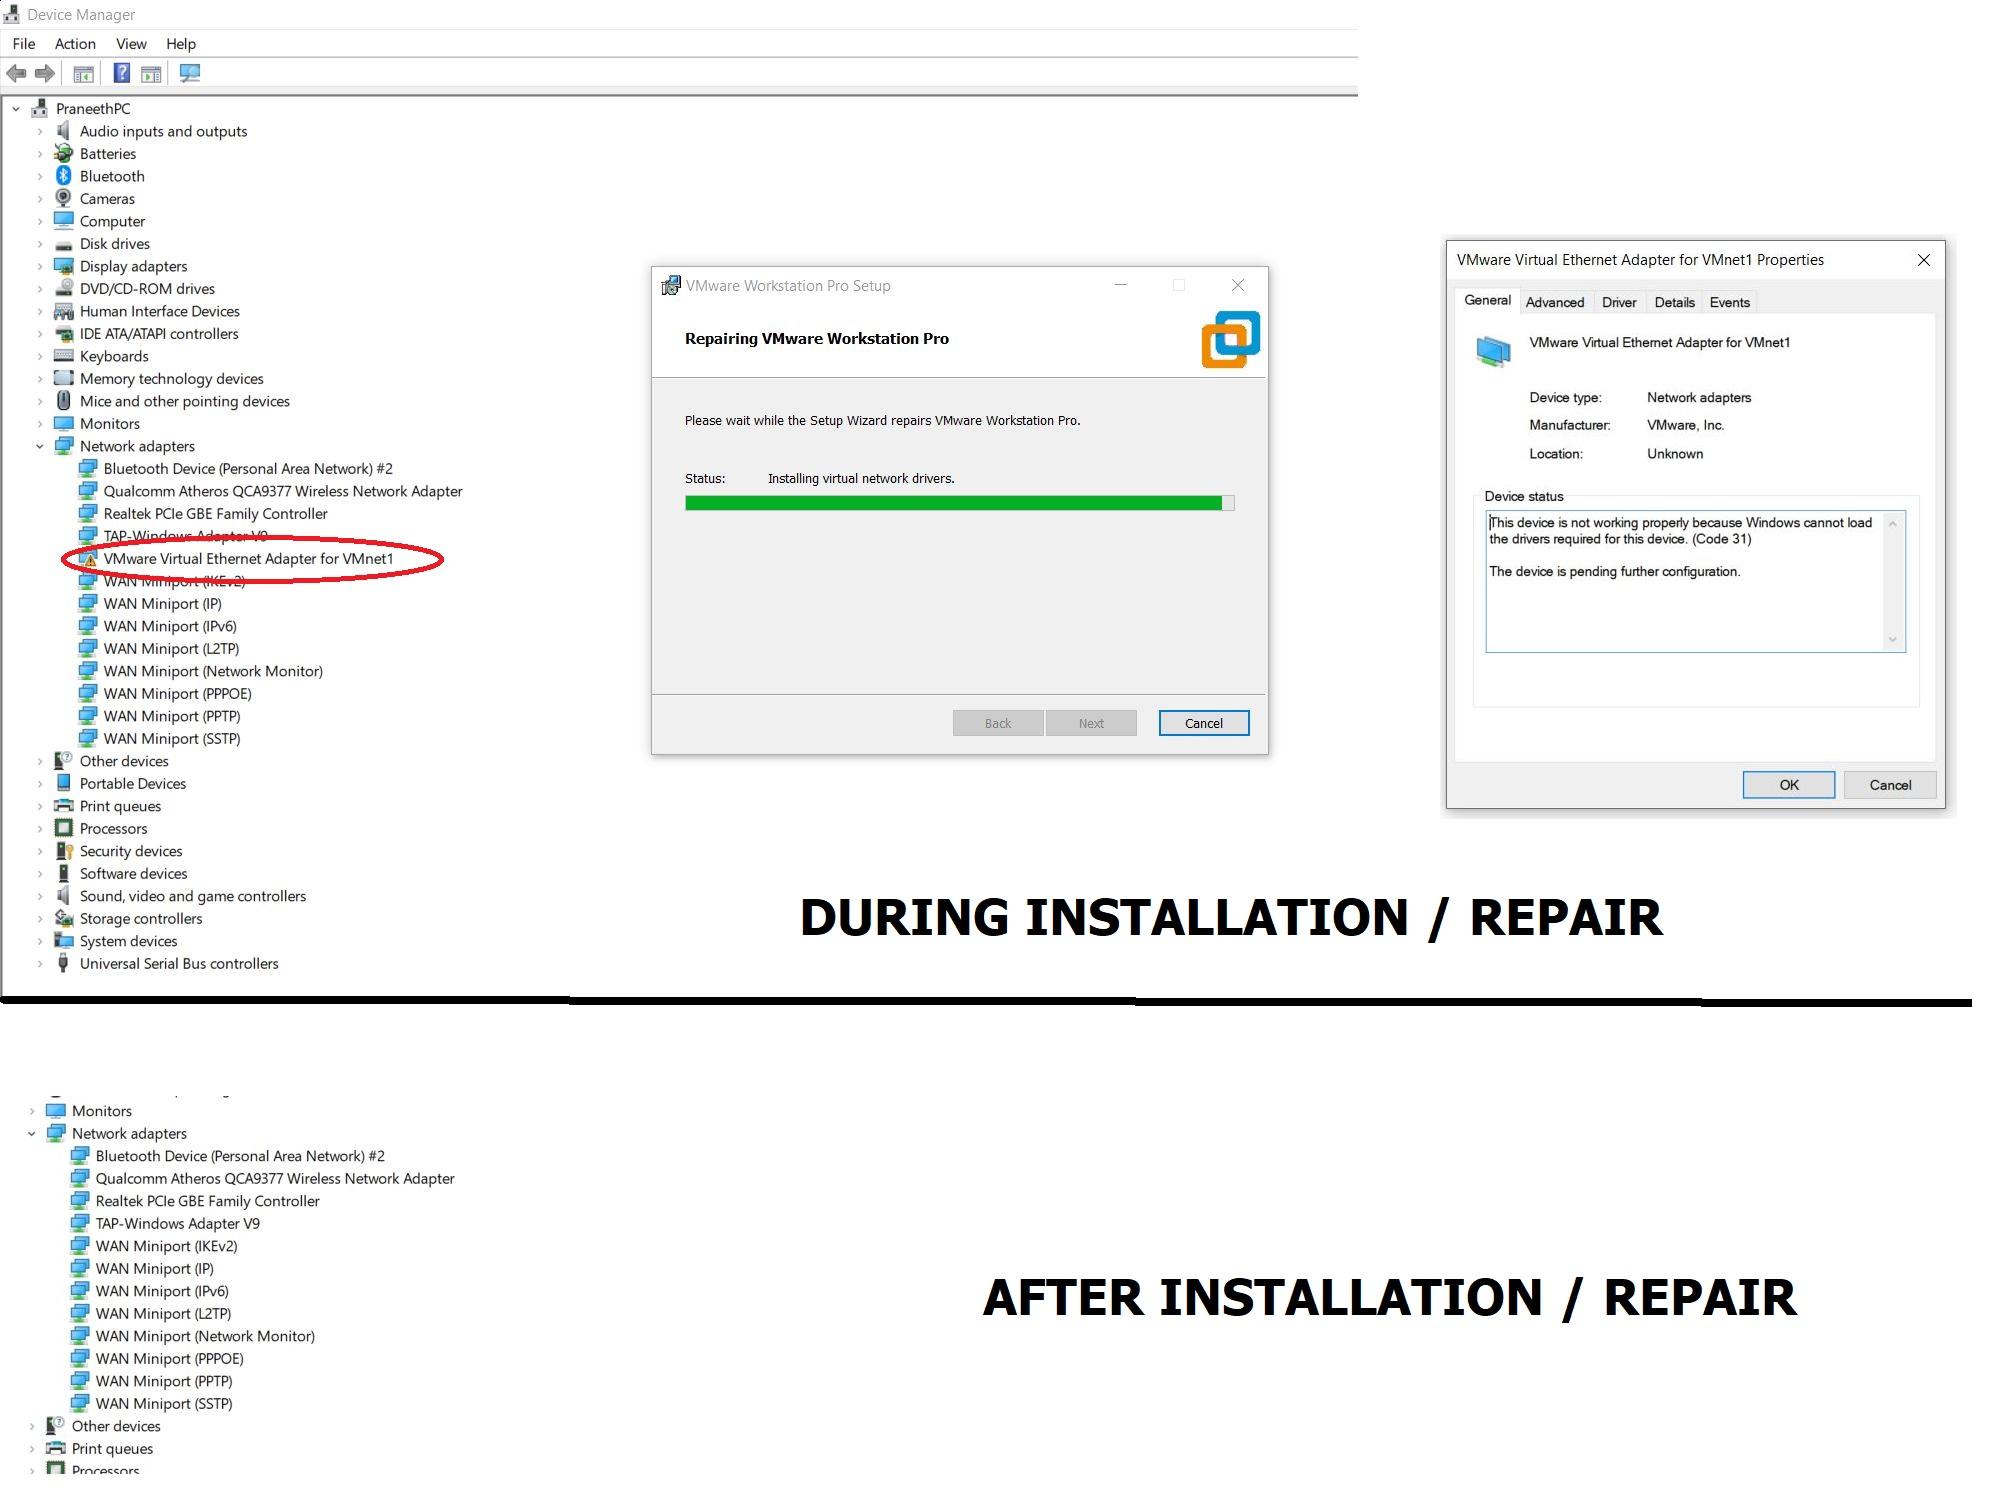 Virtual network adapter not getting installed e2fe46a4-cff3-4338-b7e7-ad7e21ba2006?upload=true.jpg